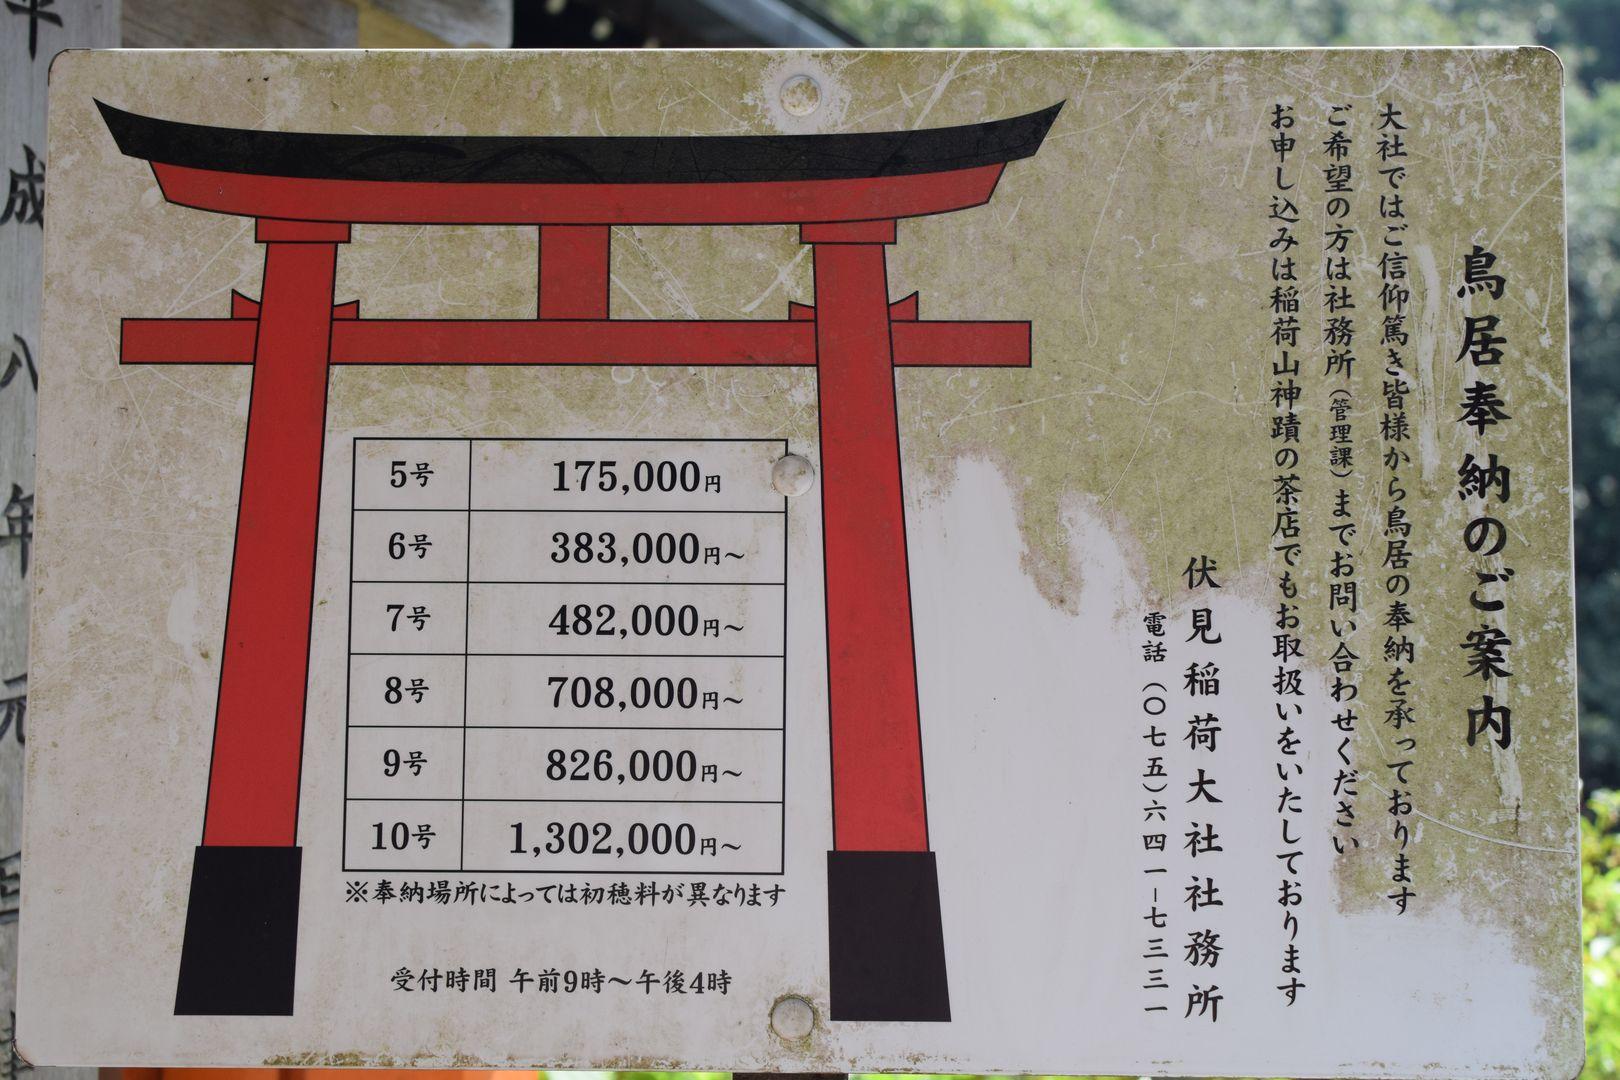 price of Torii at Fushimi Inari Taisha, Kyoto